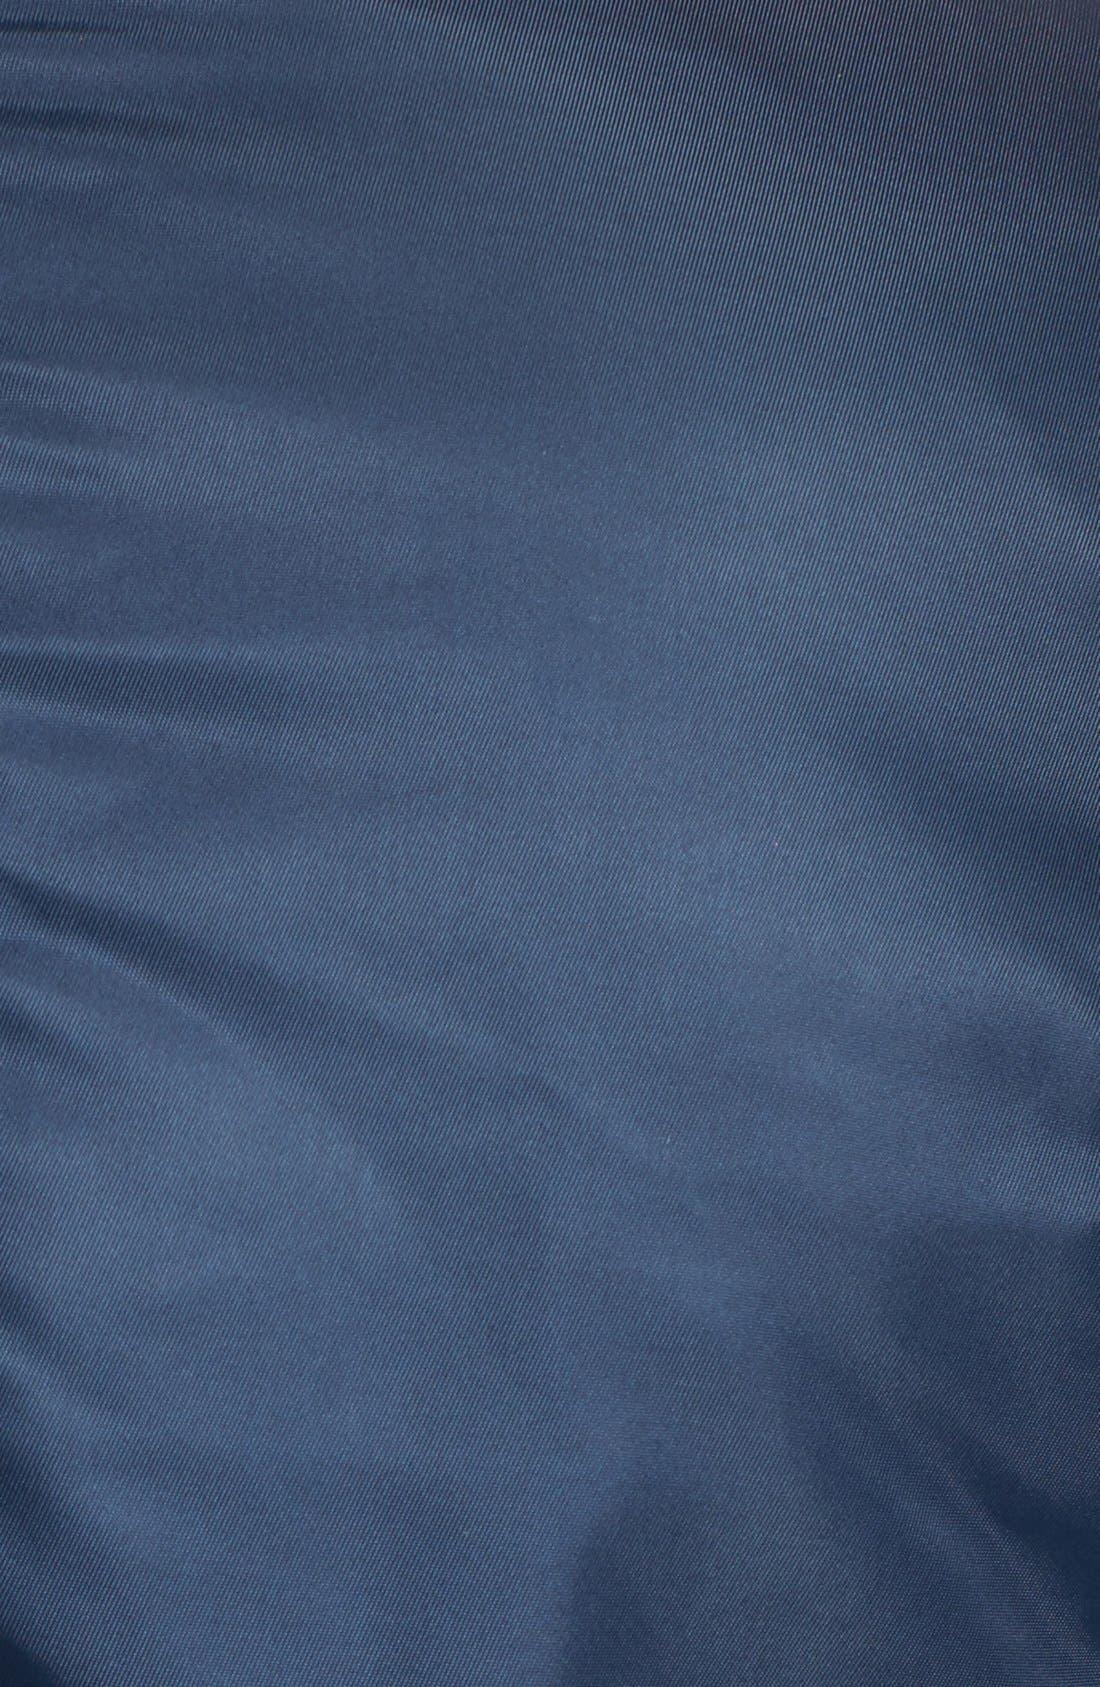 Side Zip Bomber Jacket,                             Alternate thumbnail 5, color,                             Navy